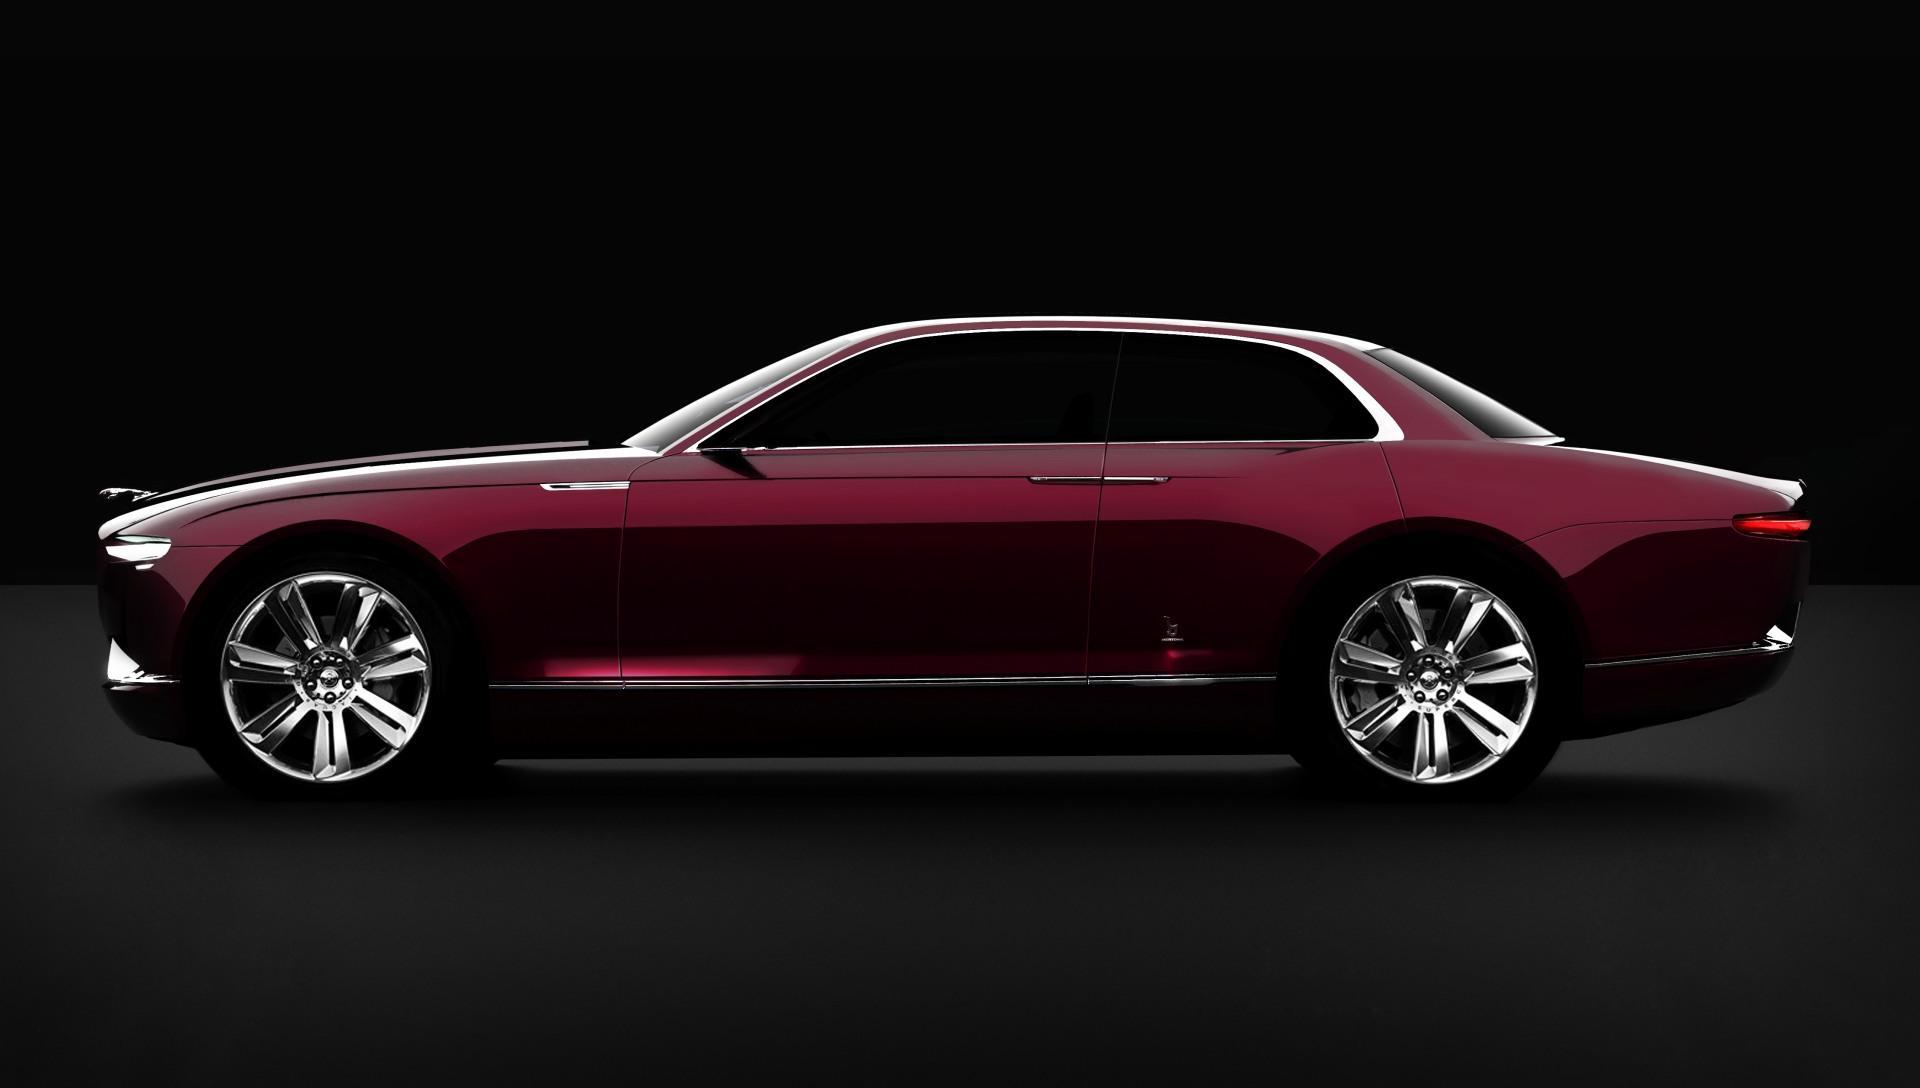 in autoart s racing jaguar models xkr italian red pin